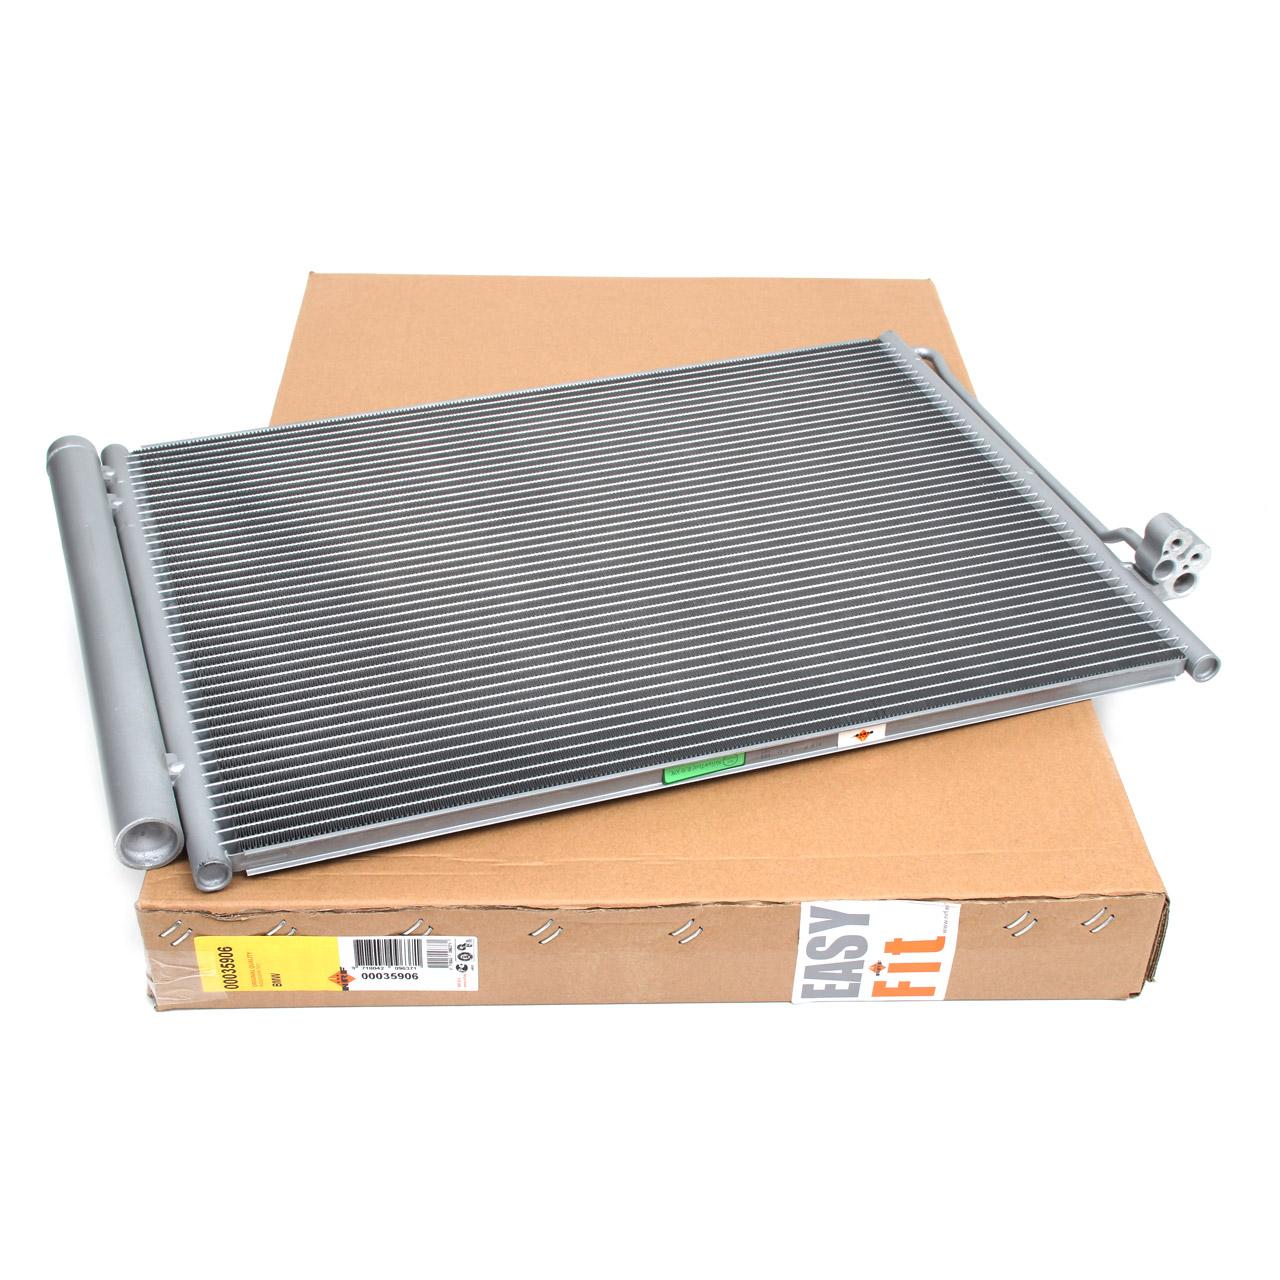 NRF 35906 Kondensator Klima EASY FIT BMW X5 E70 F15 F85 X6 E71 E72 F16 F86 64509239992